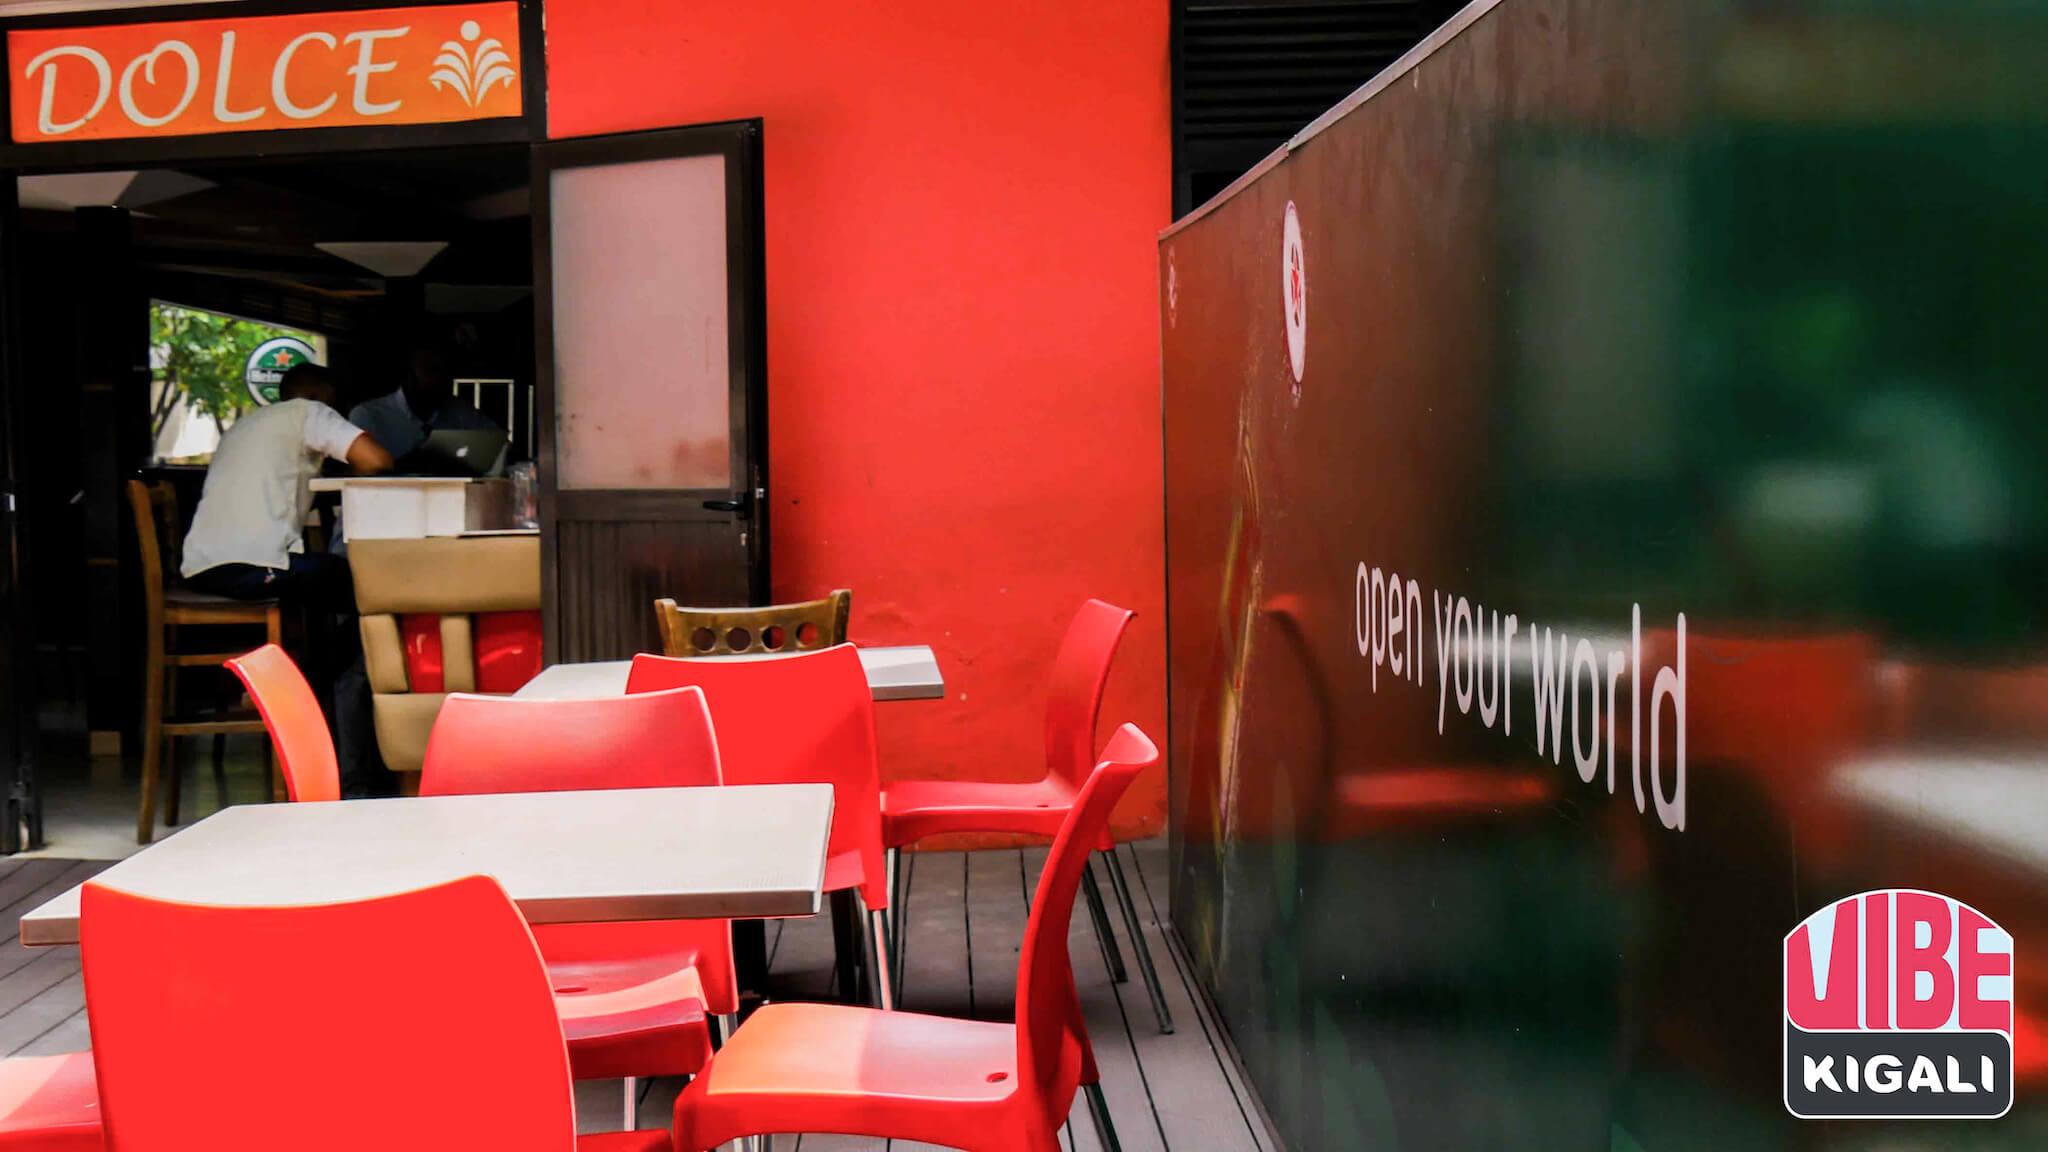 Dolce Bar & Restaurant Pizzeria